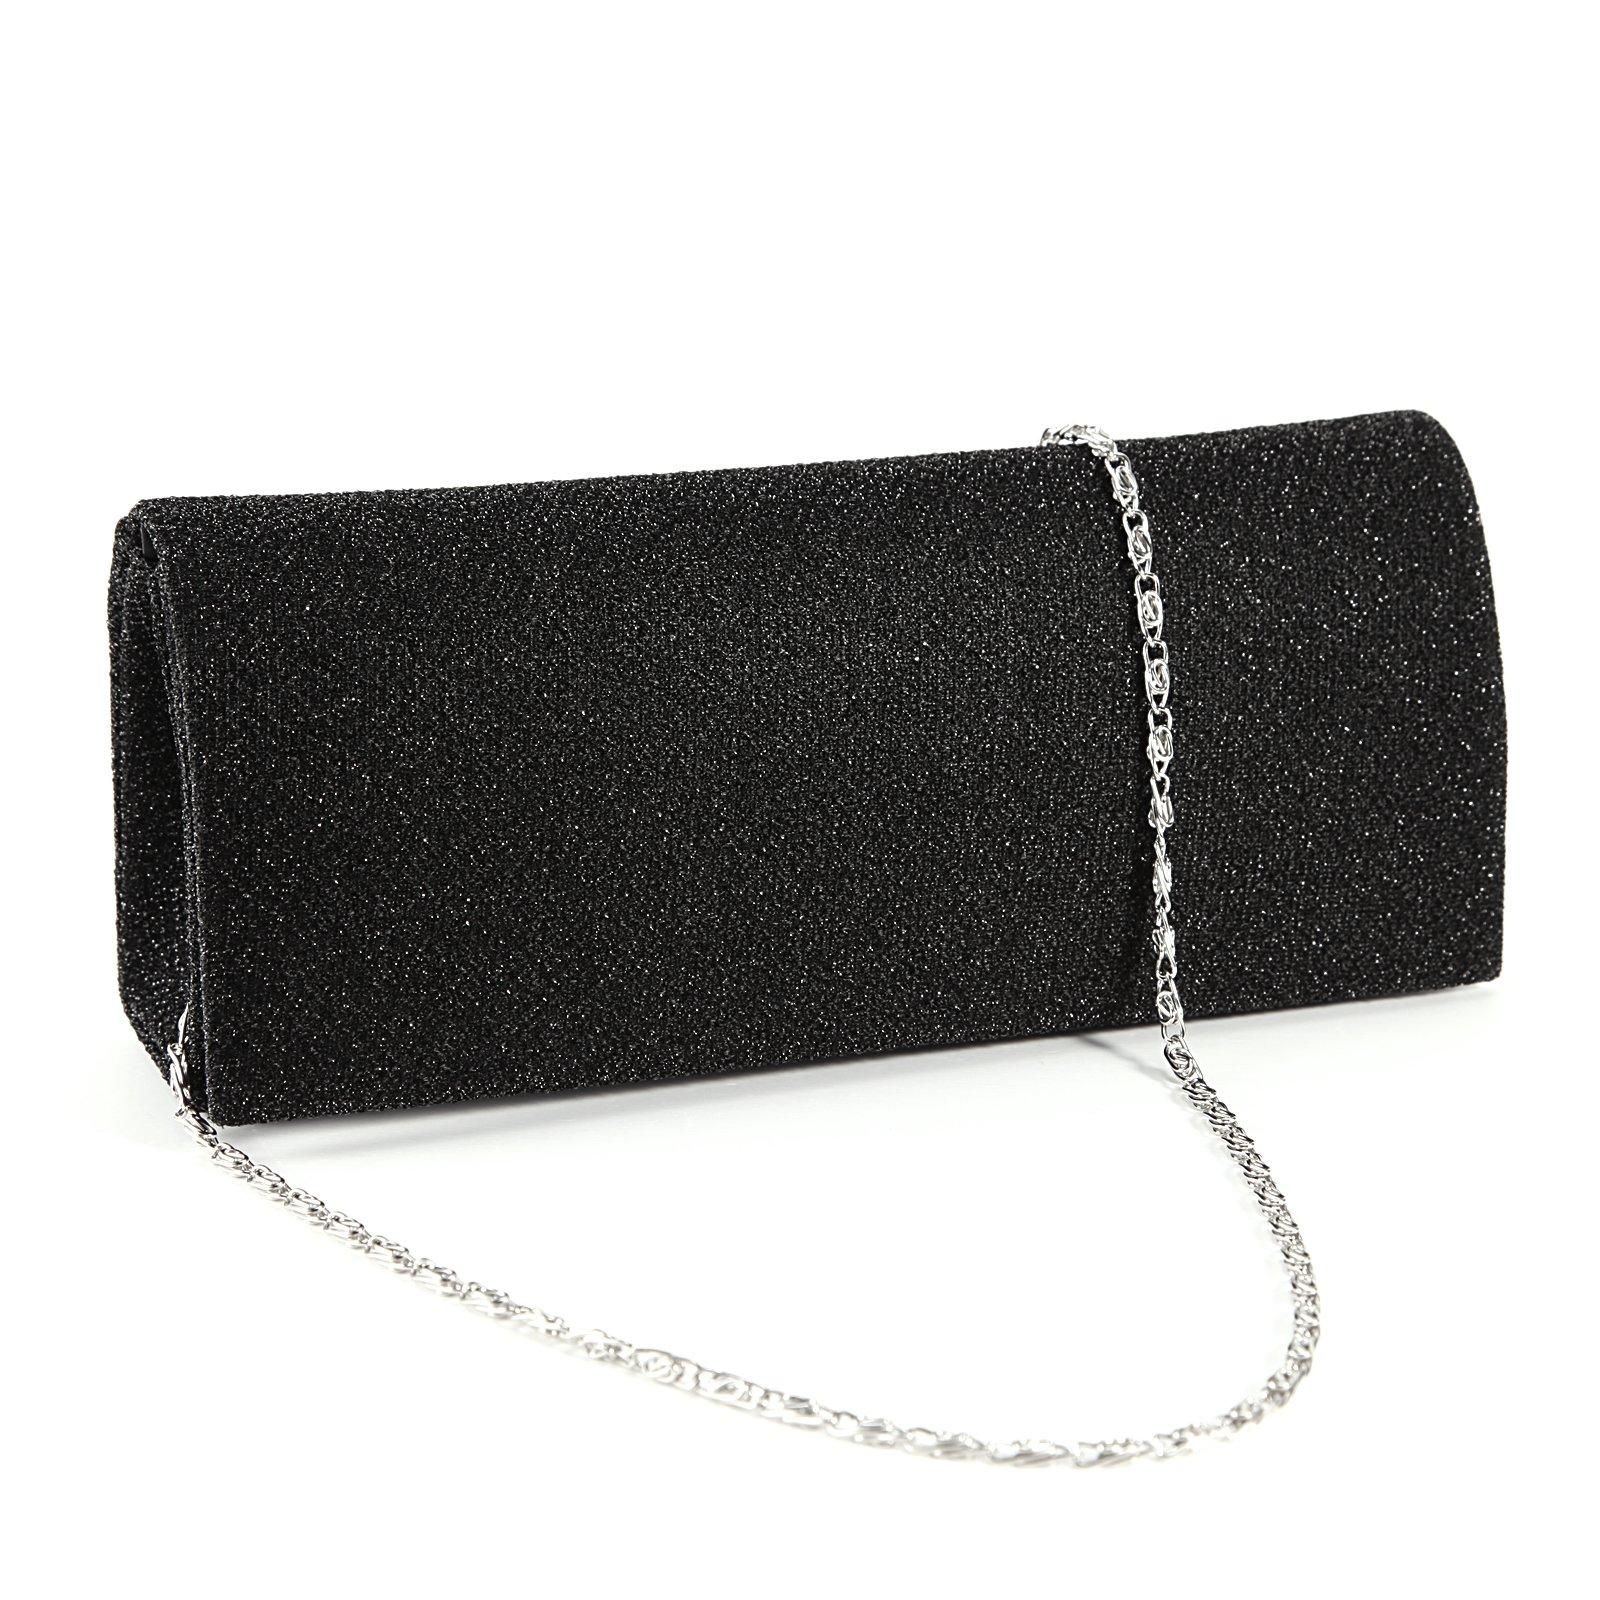 Dazzling Glitter-Tone Fine Lines Women Clutch Hand Carry Bag Prom Evening Purse